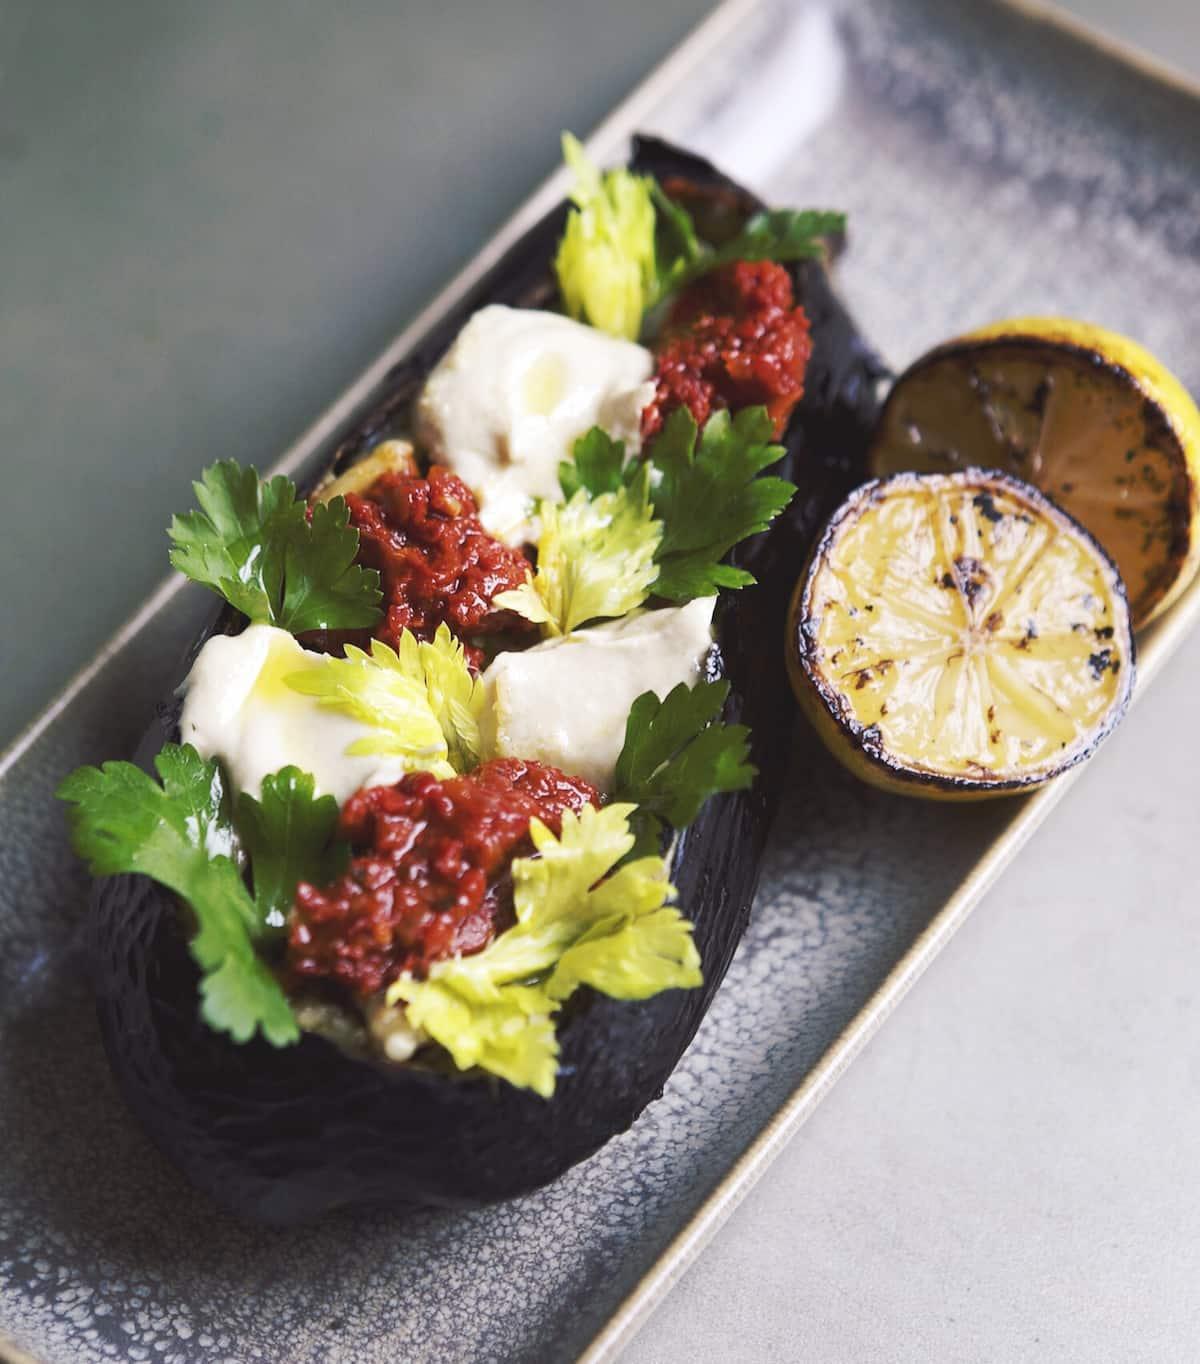 vegan restaurants in new orleans